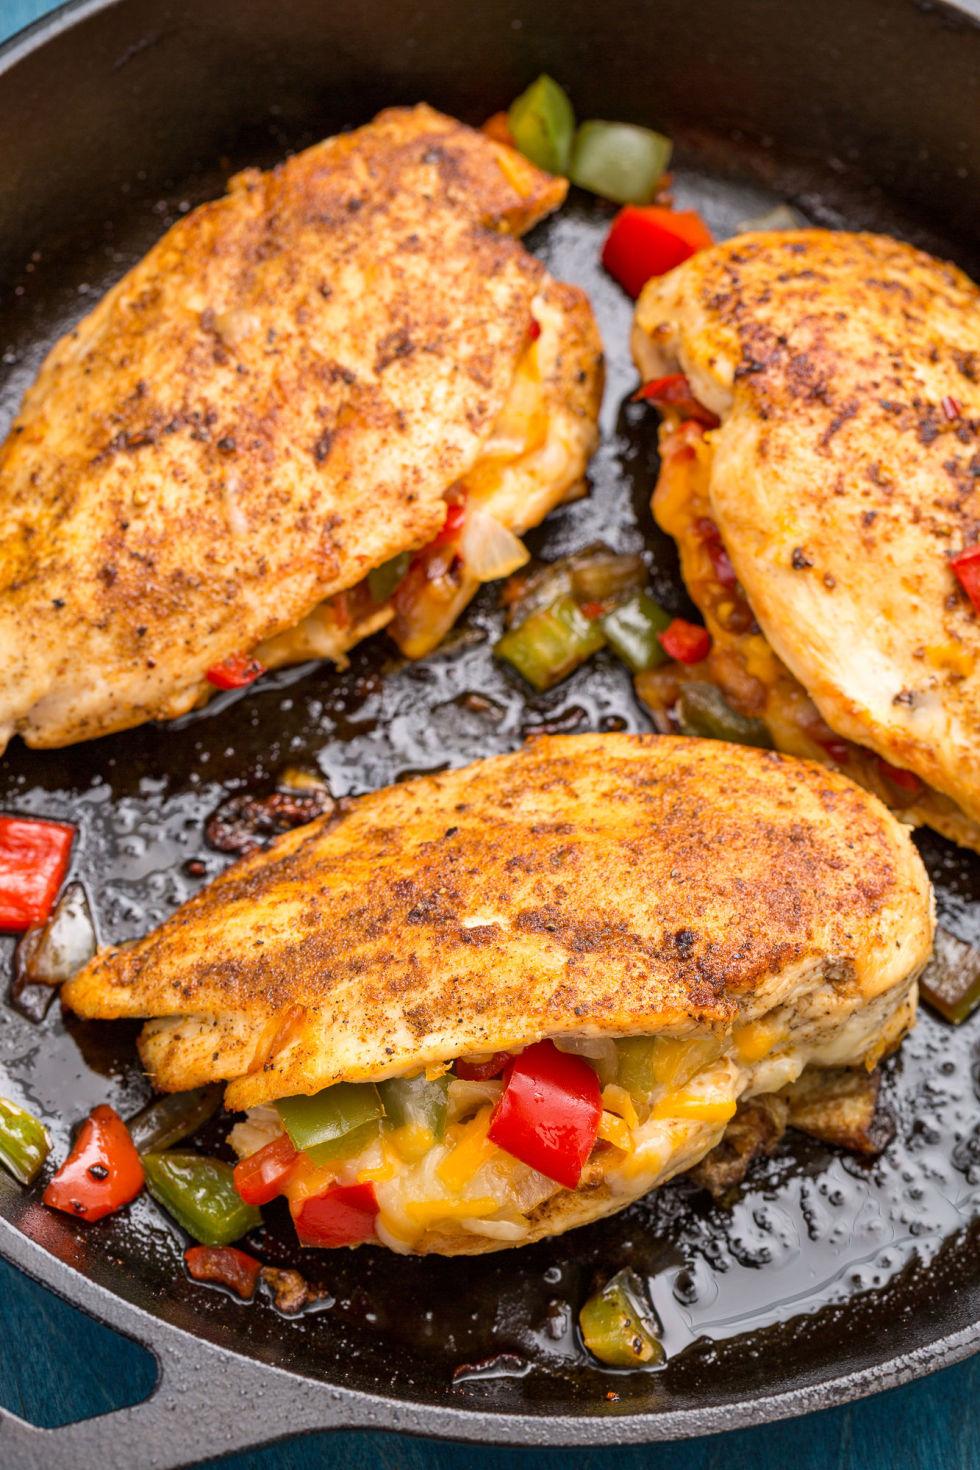 Easy recipes using chicken breast